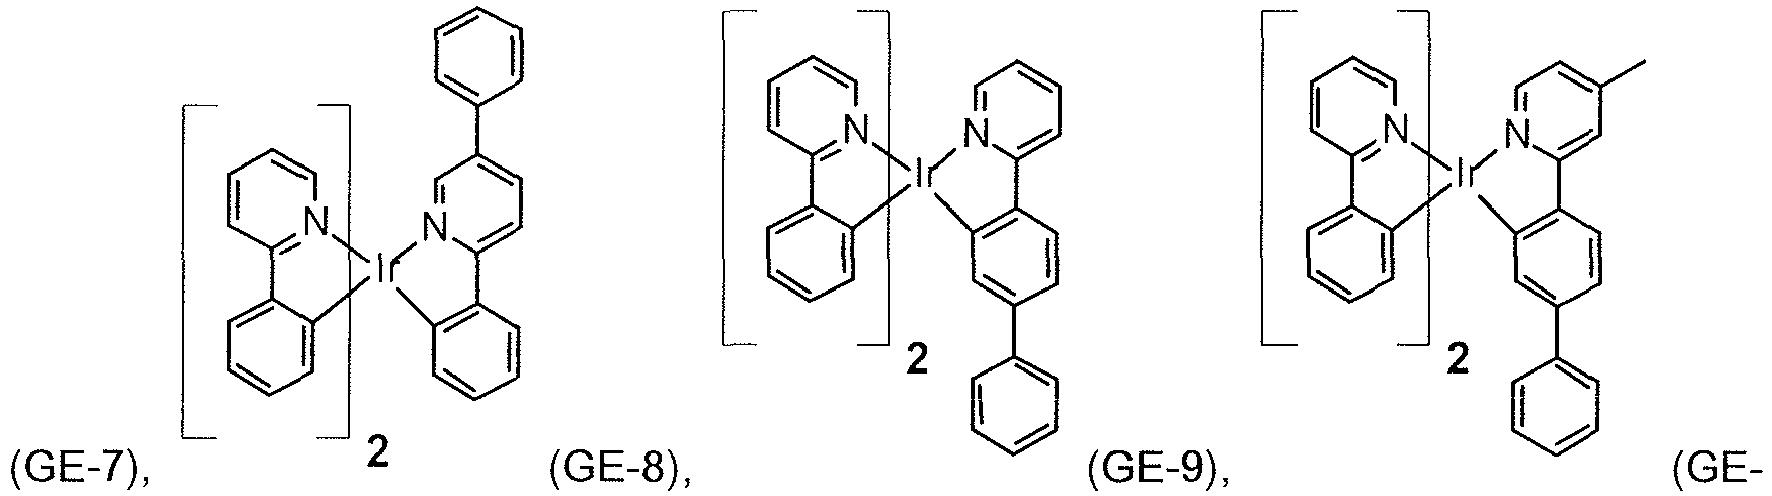 Figure imgb0653